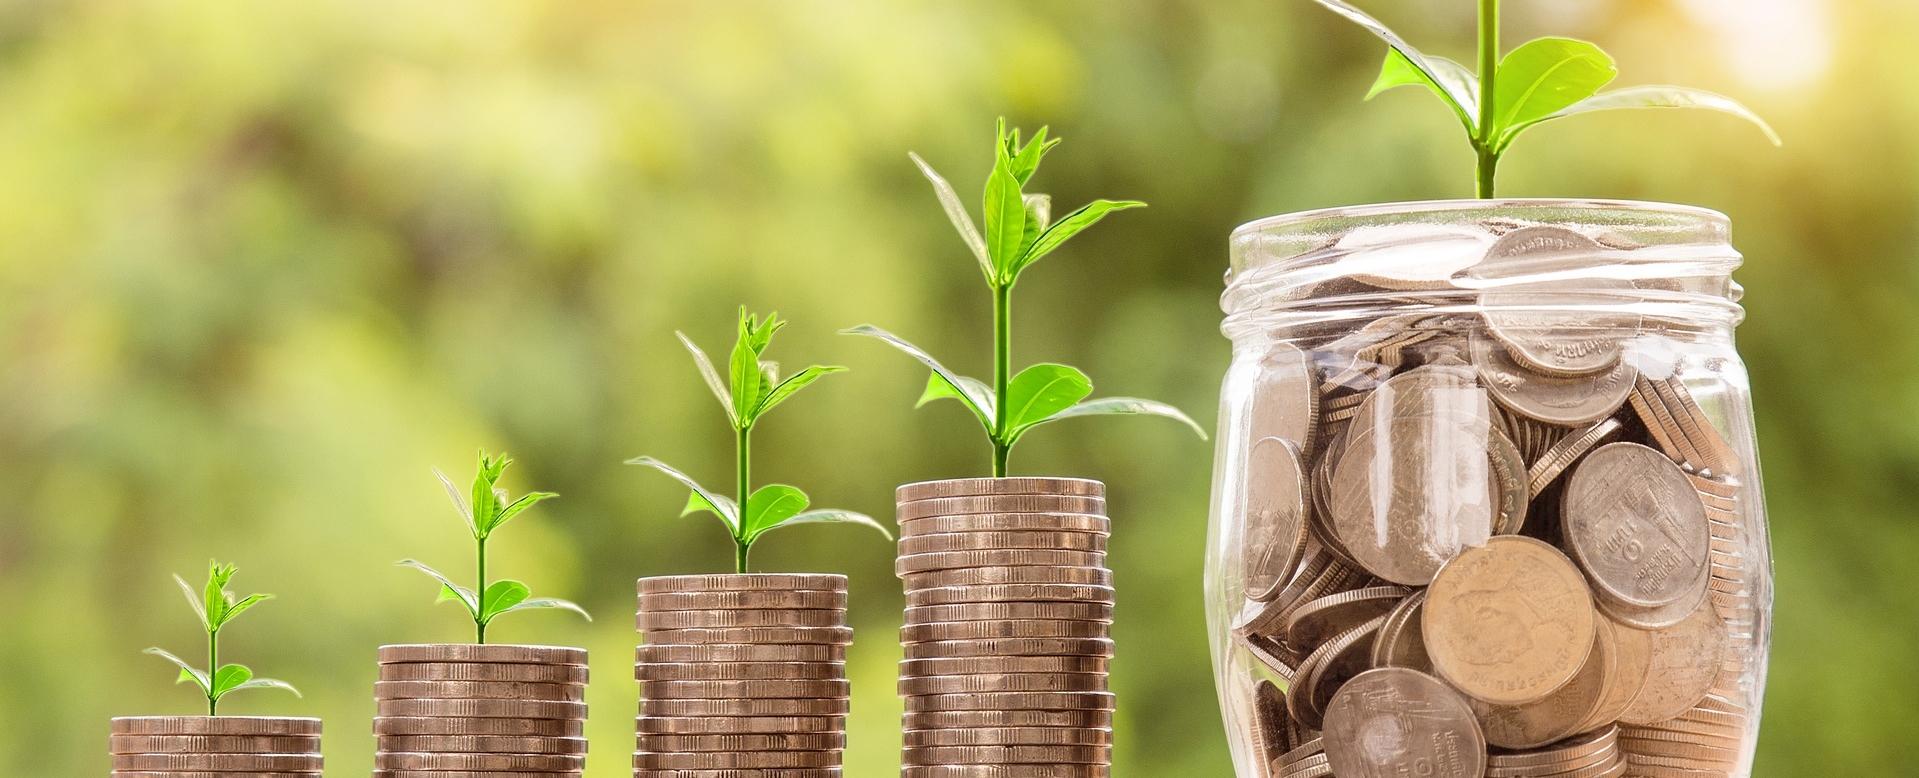 Your eco service benefits